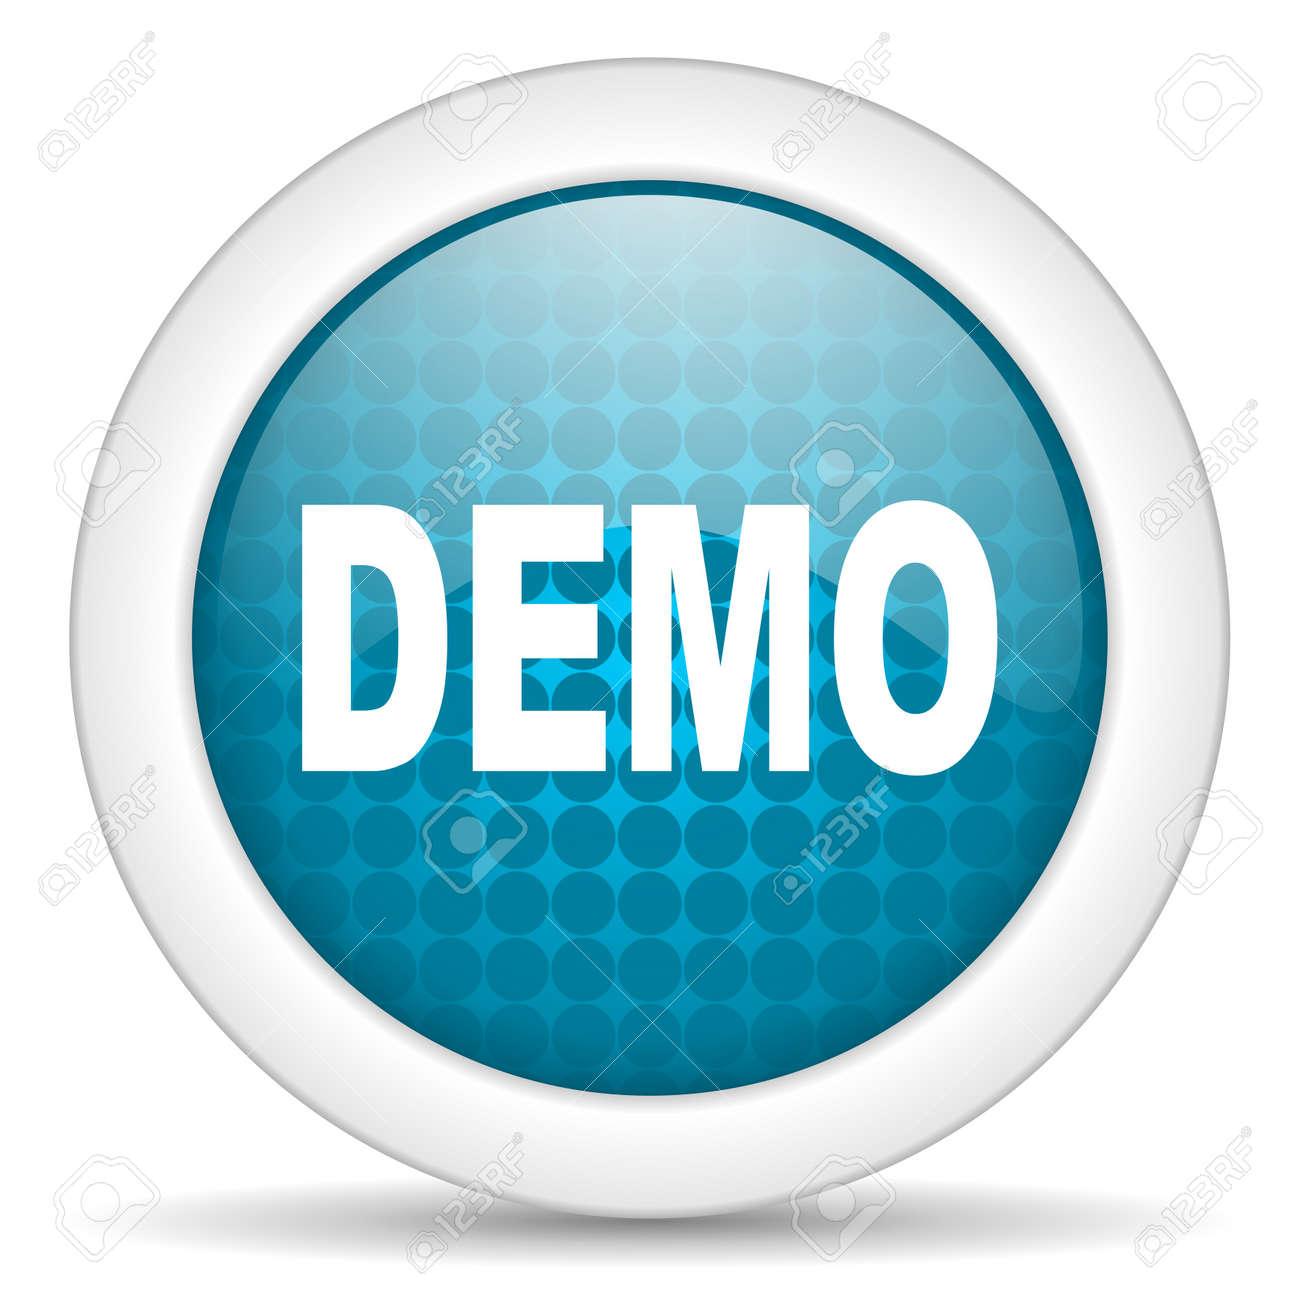 demo icon Stock Photo - 15464032